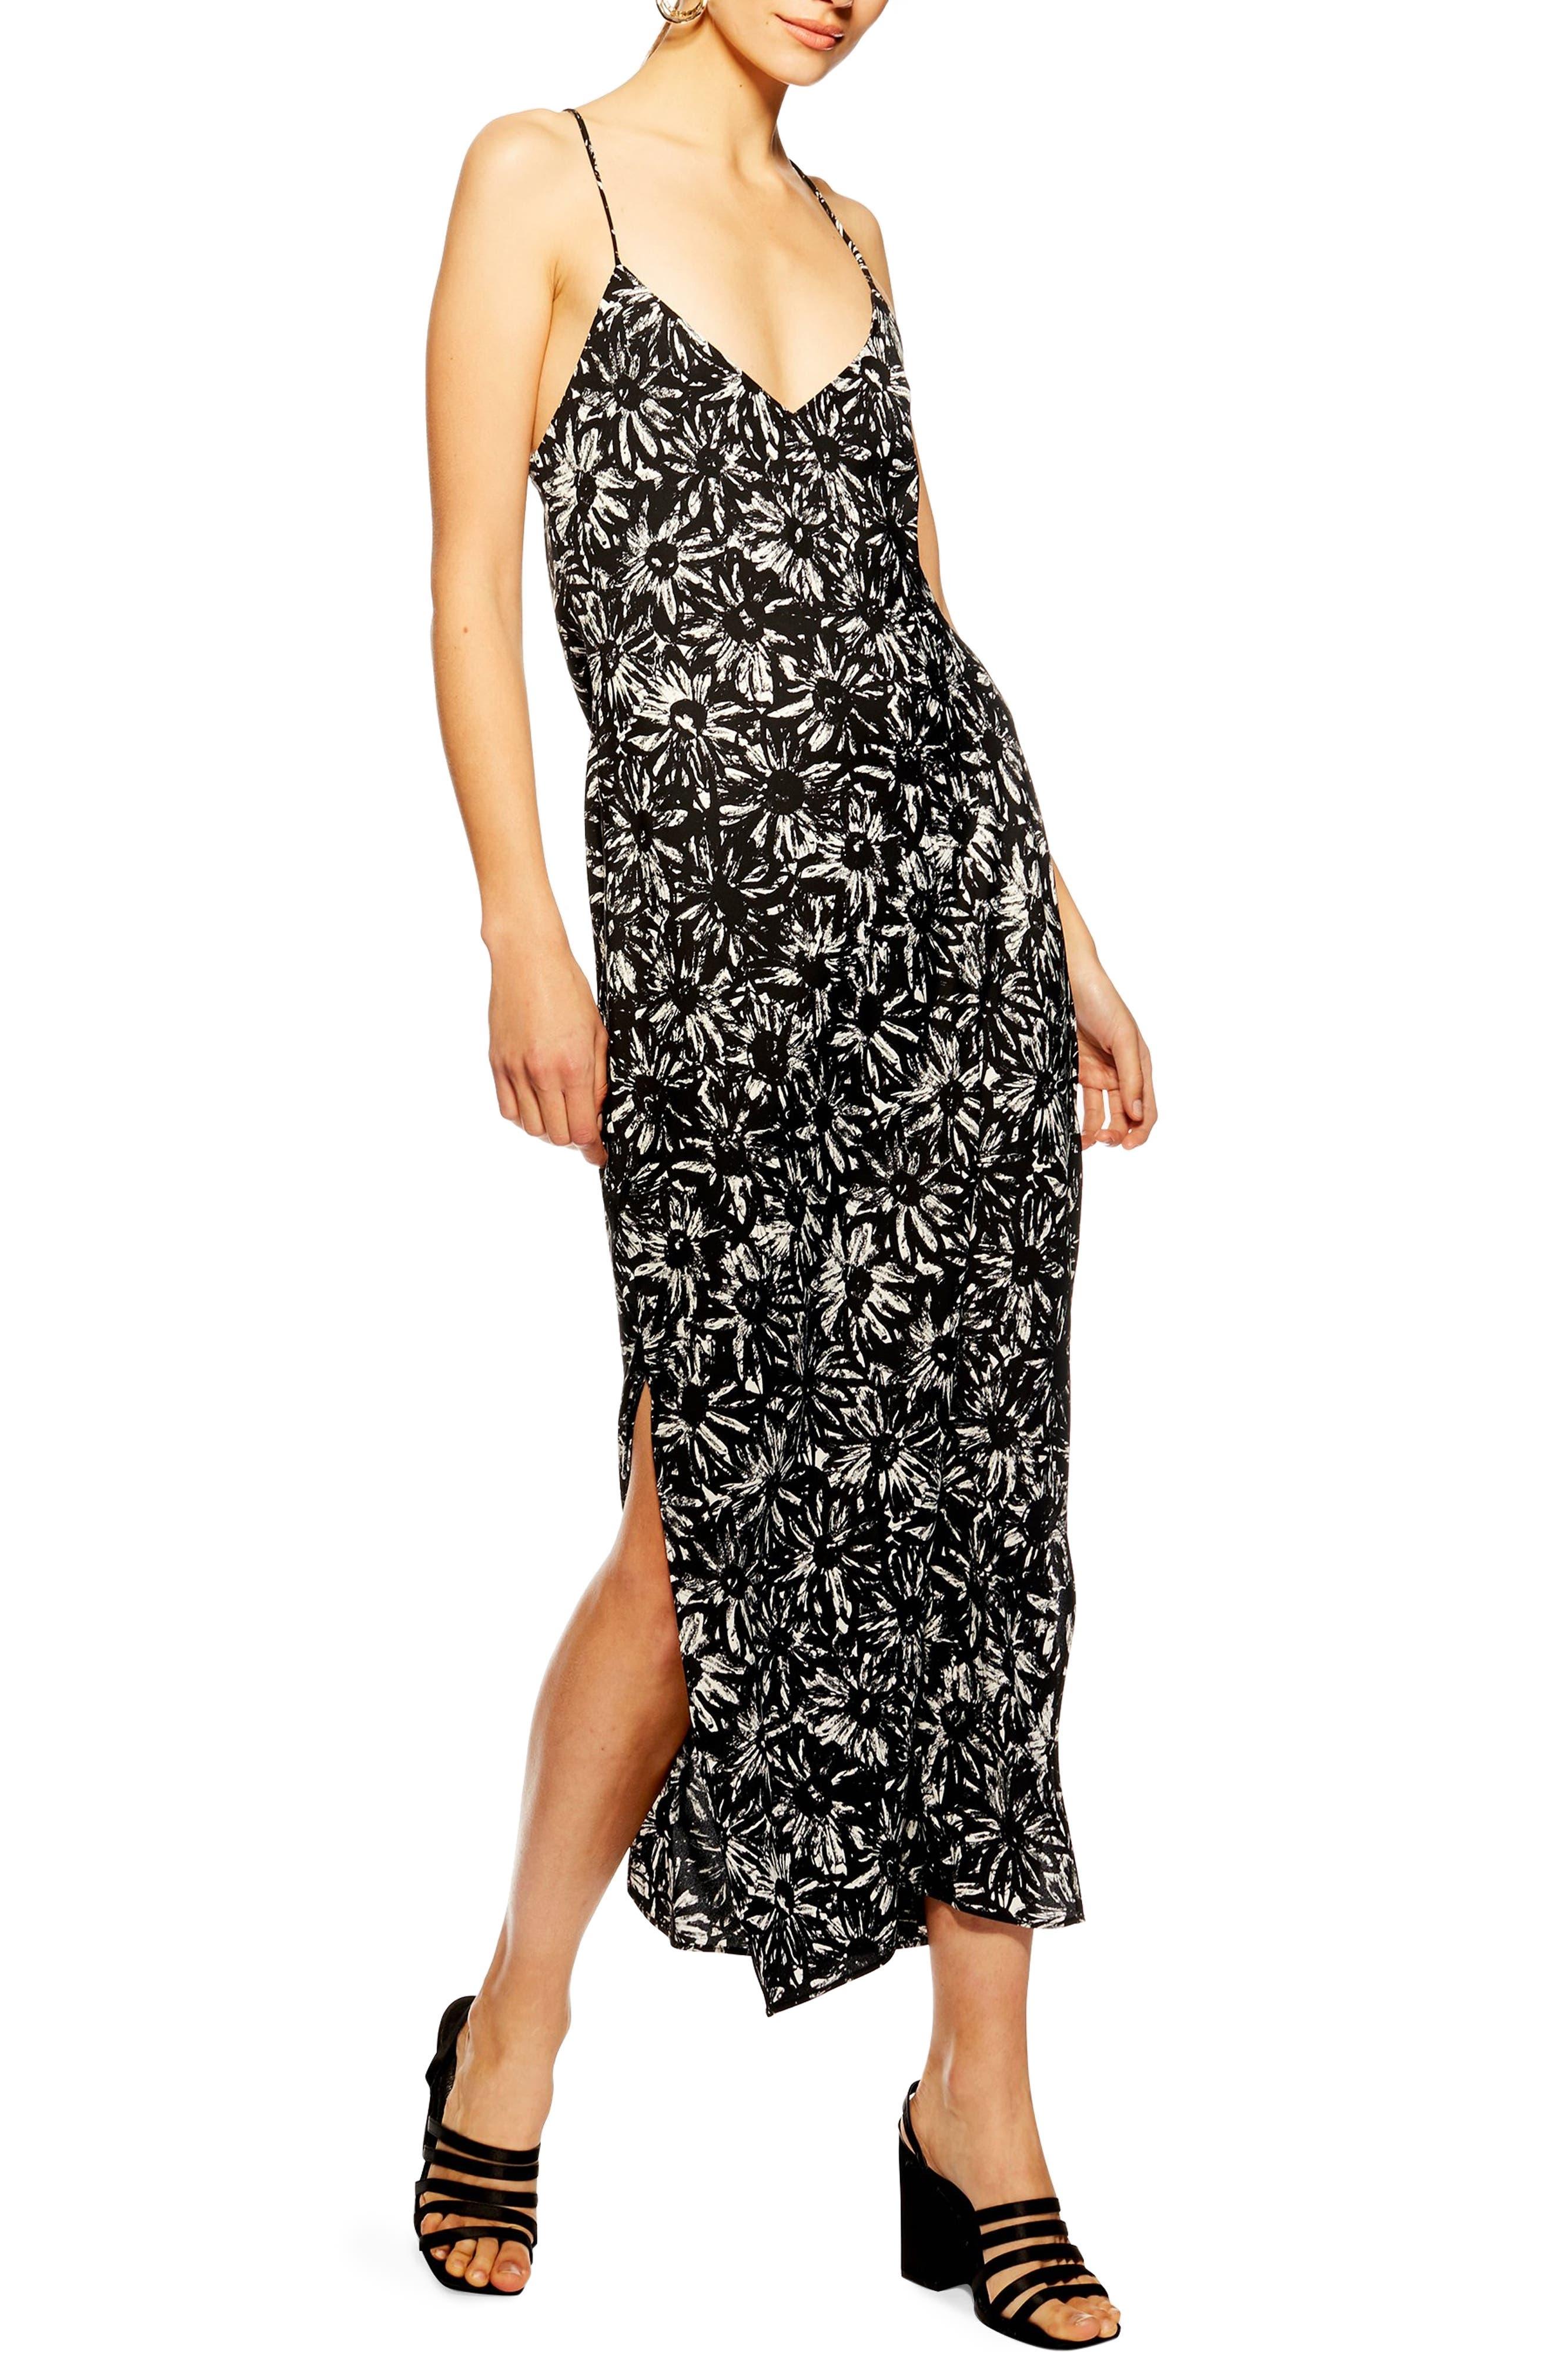 Topshop Daisy Slipdress, US (fits like 0) - Black